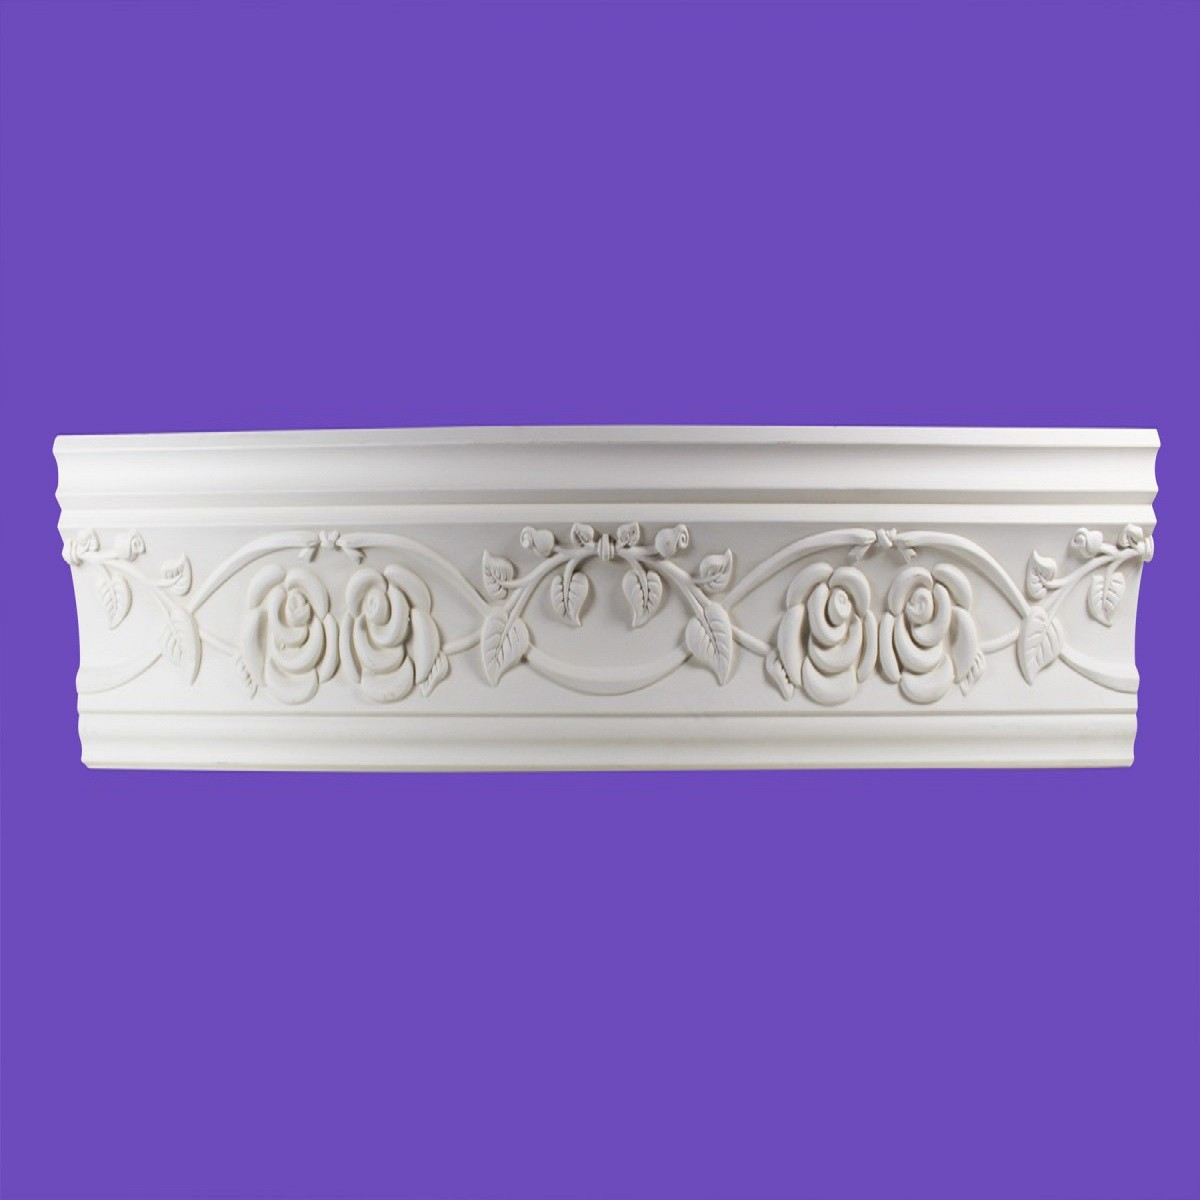 Cornice White Urethane 23.5 Sample of 11446 Cornice Cornice Moulding Cornice Molding